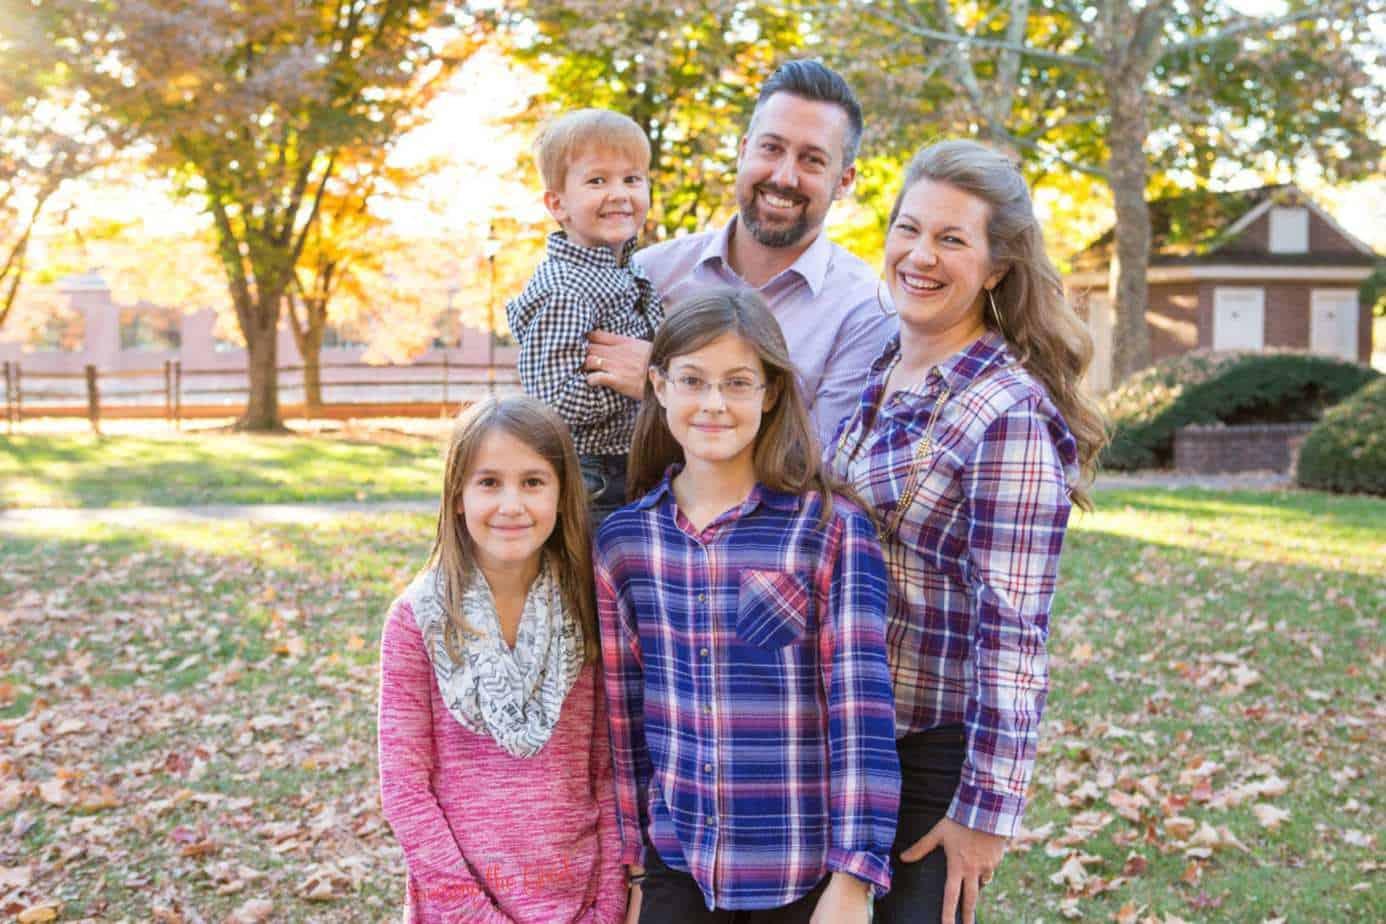 Savoring the Good Family Photo